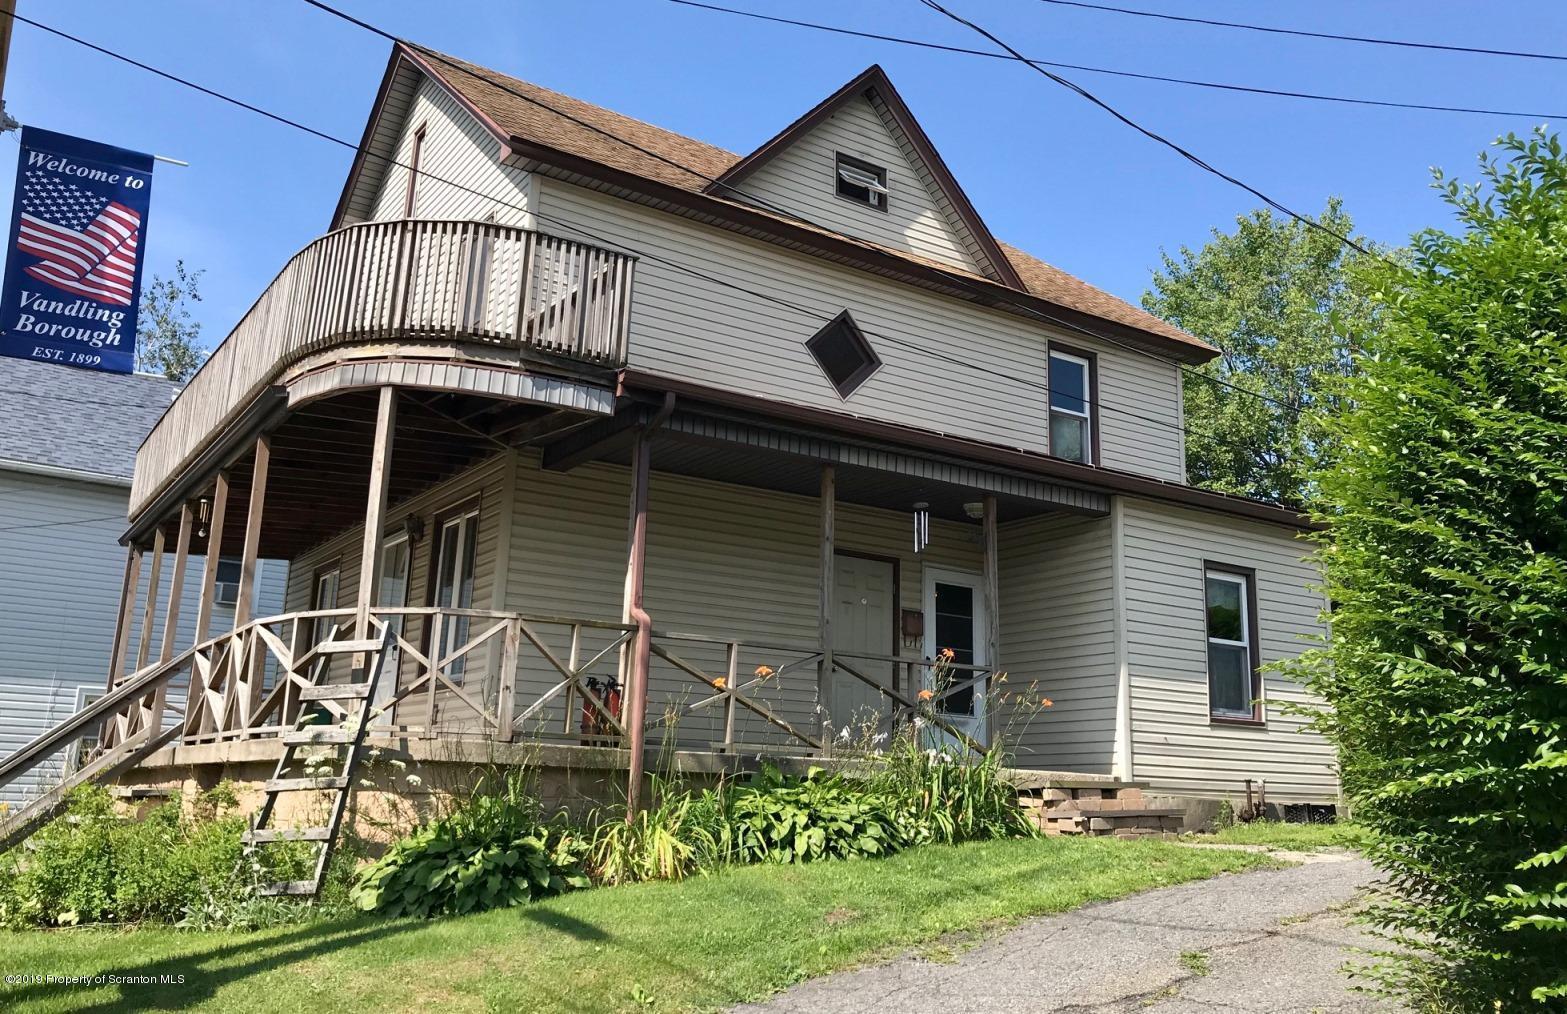 629 Clinton St, Forest City, Pennsylvania 18421, 3 Bedrooms Bedrooms, 6 Rooms Rooms,2 BathroomsBathrooms,Single Family,For Sale,Clinton,19-3778